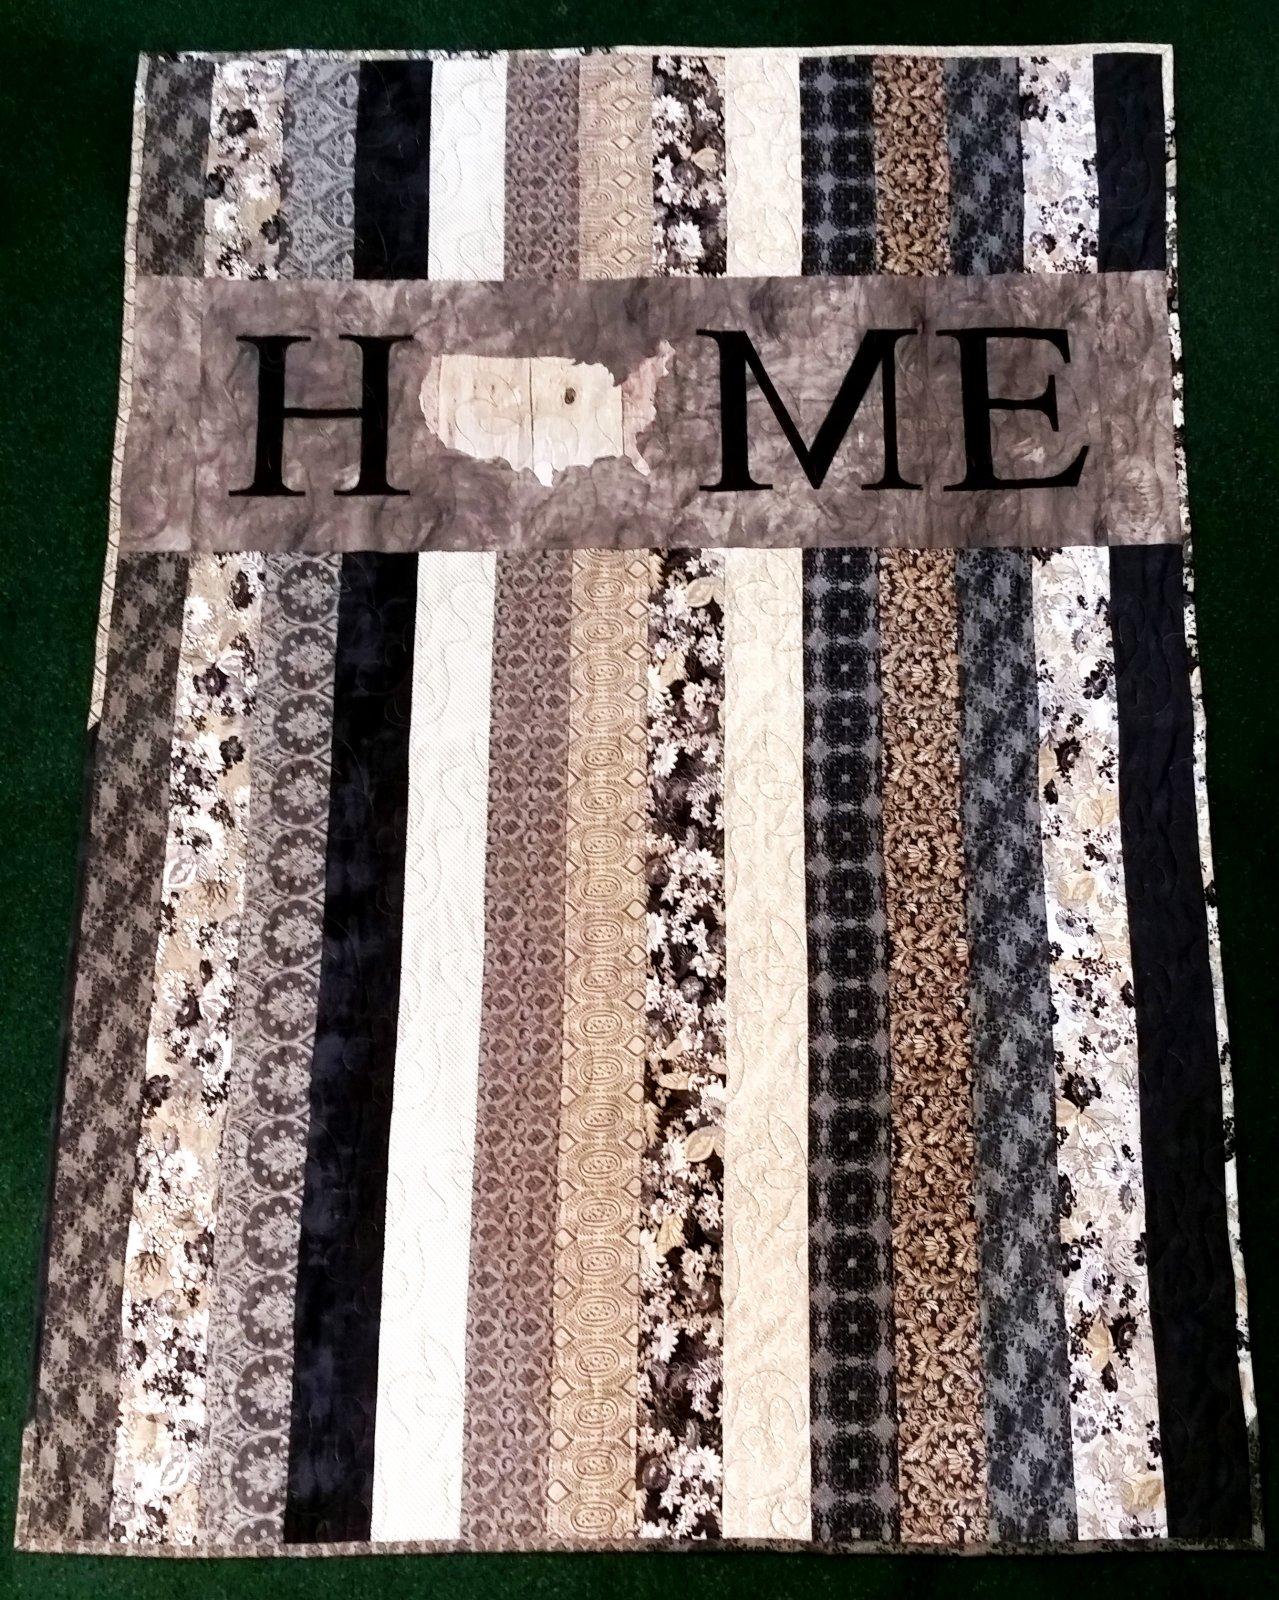 No Place Like Home-Black Tie